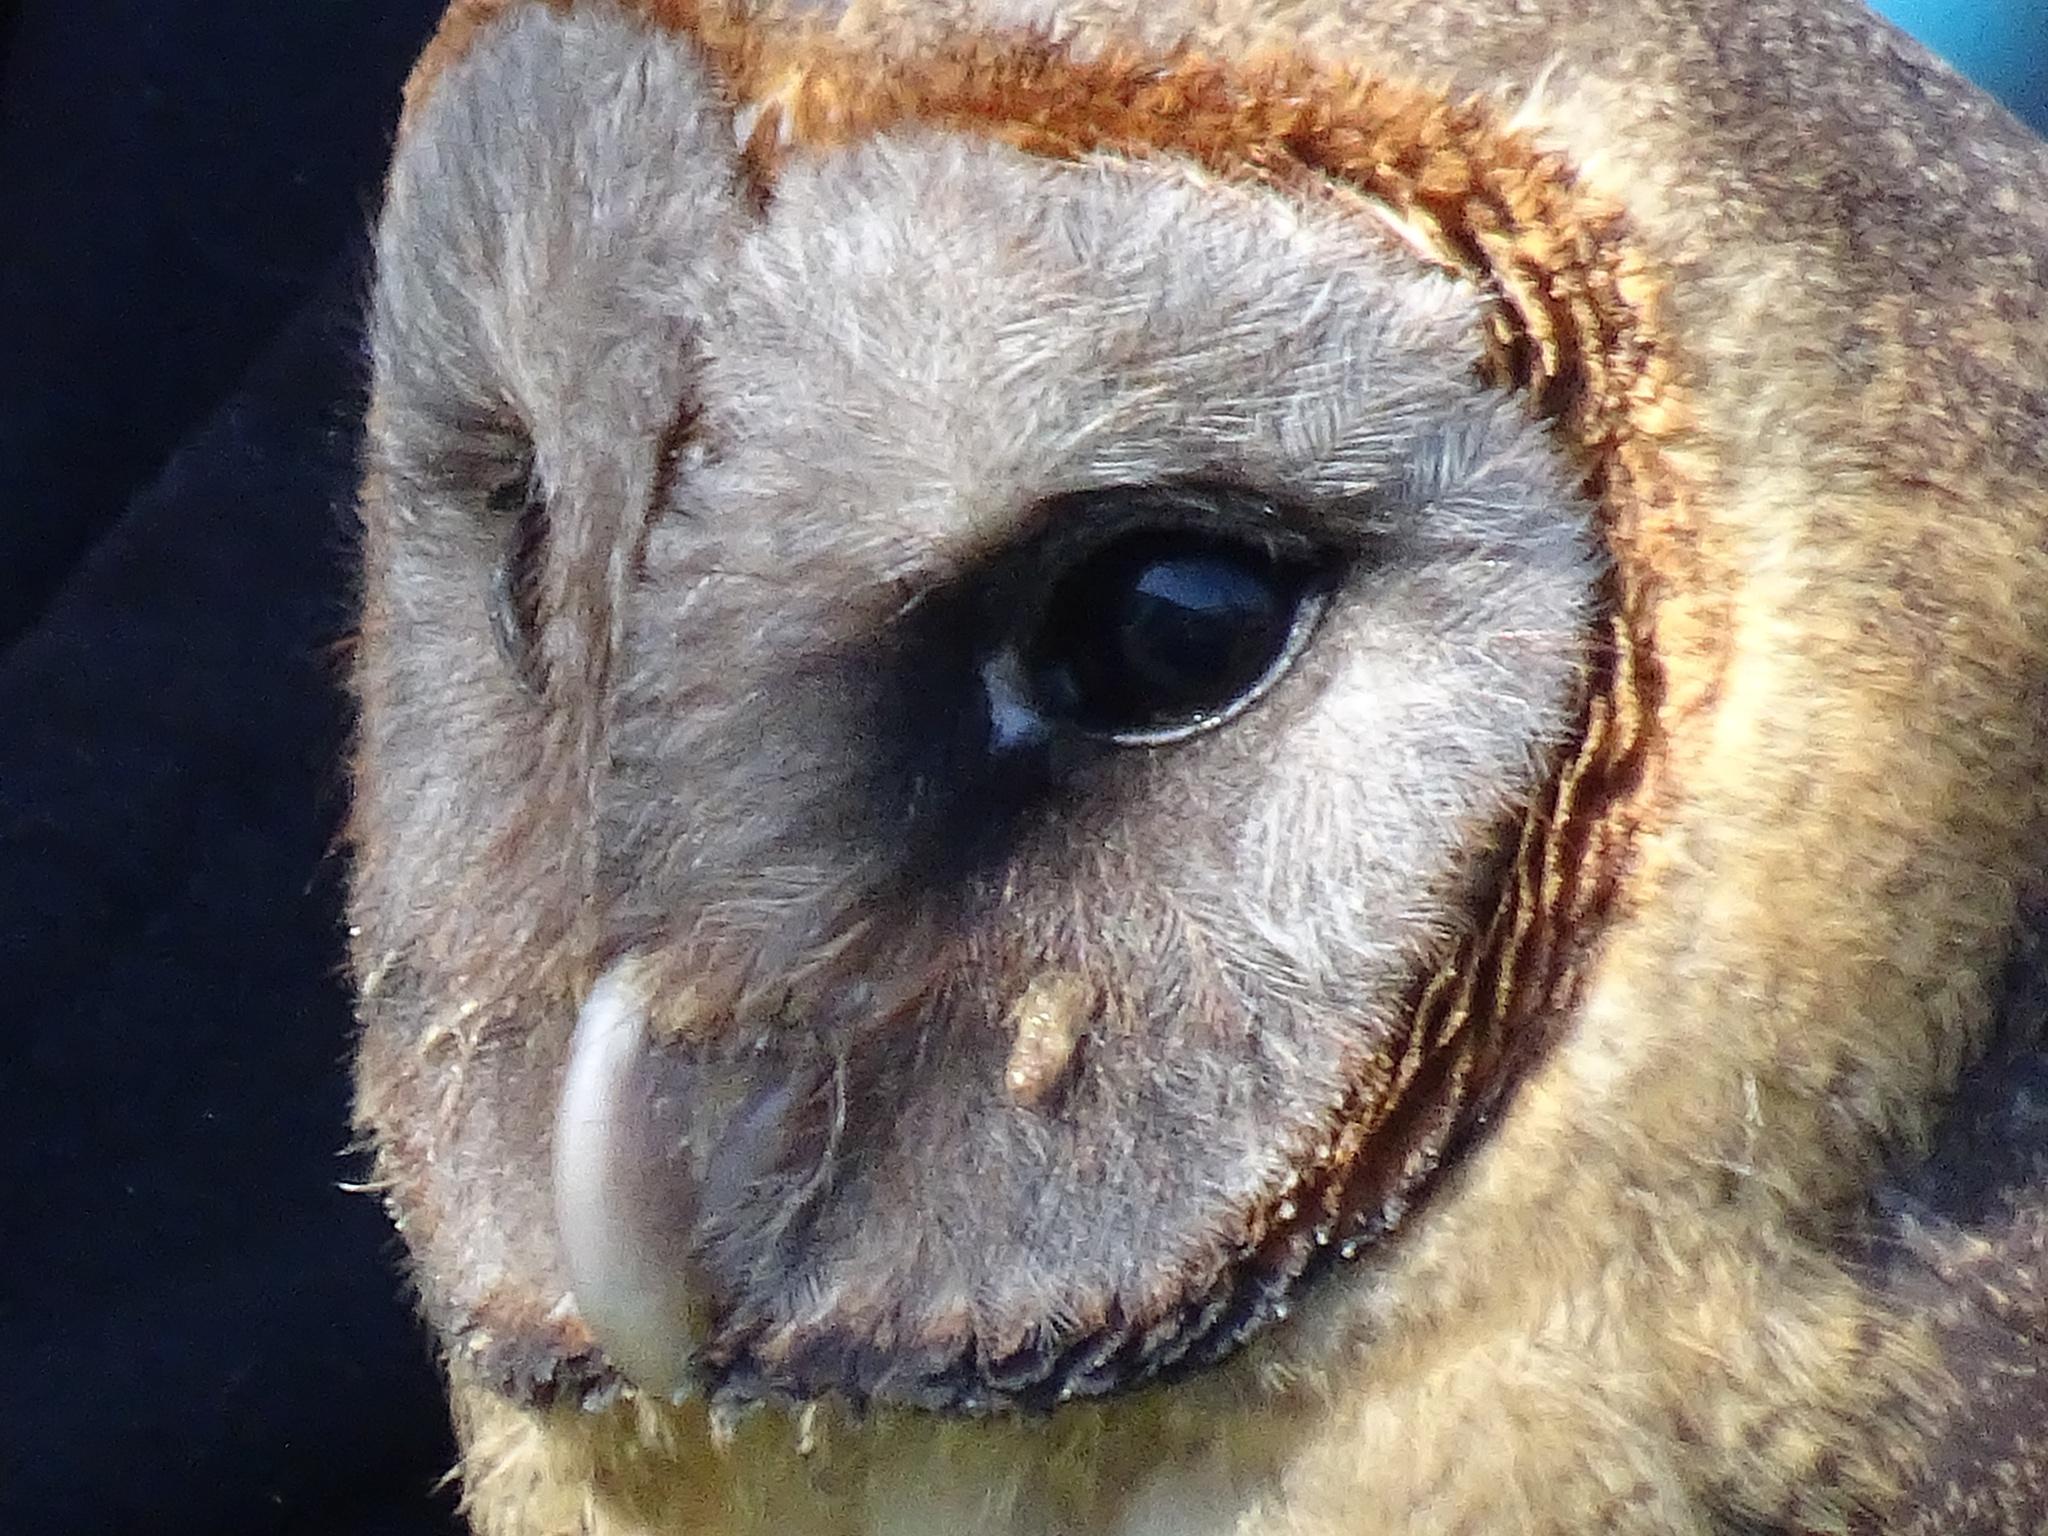 Owl by erol.antz